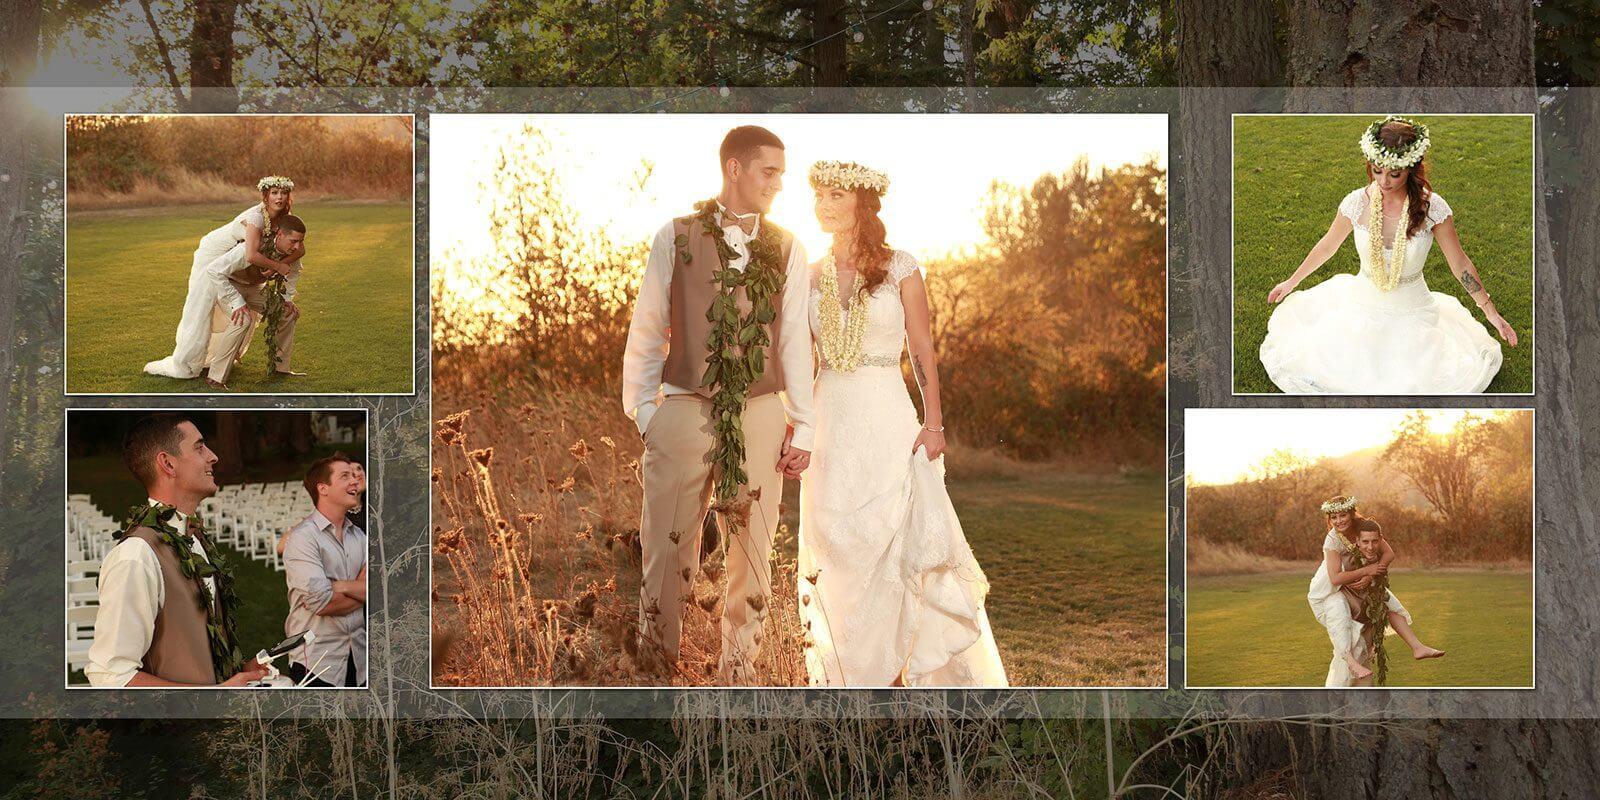 Jasper-House-Farm-Outdoor-Wedding-Lane-County-Oregon-photographers-068-069.jpg